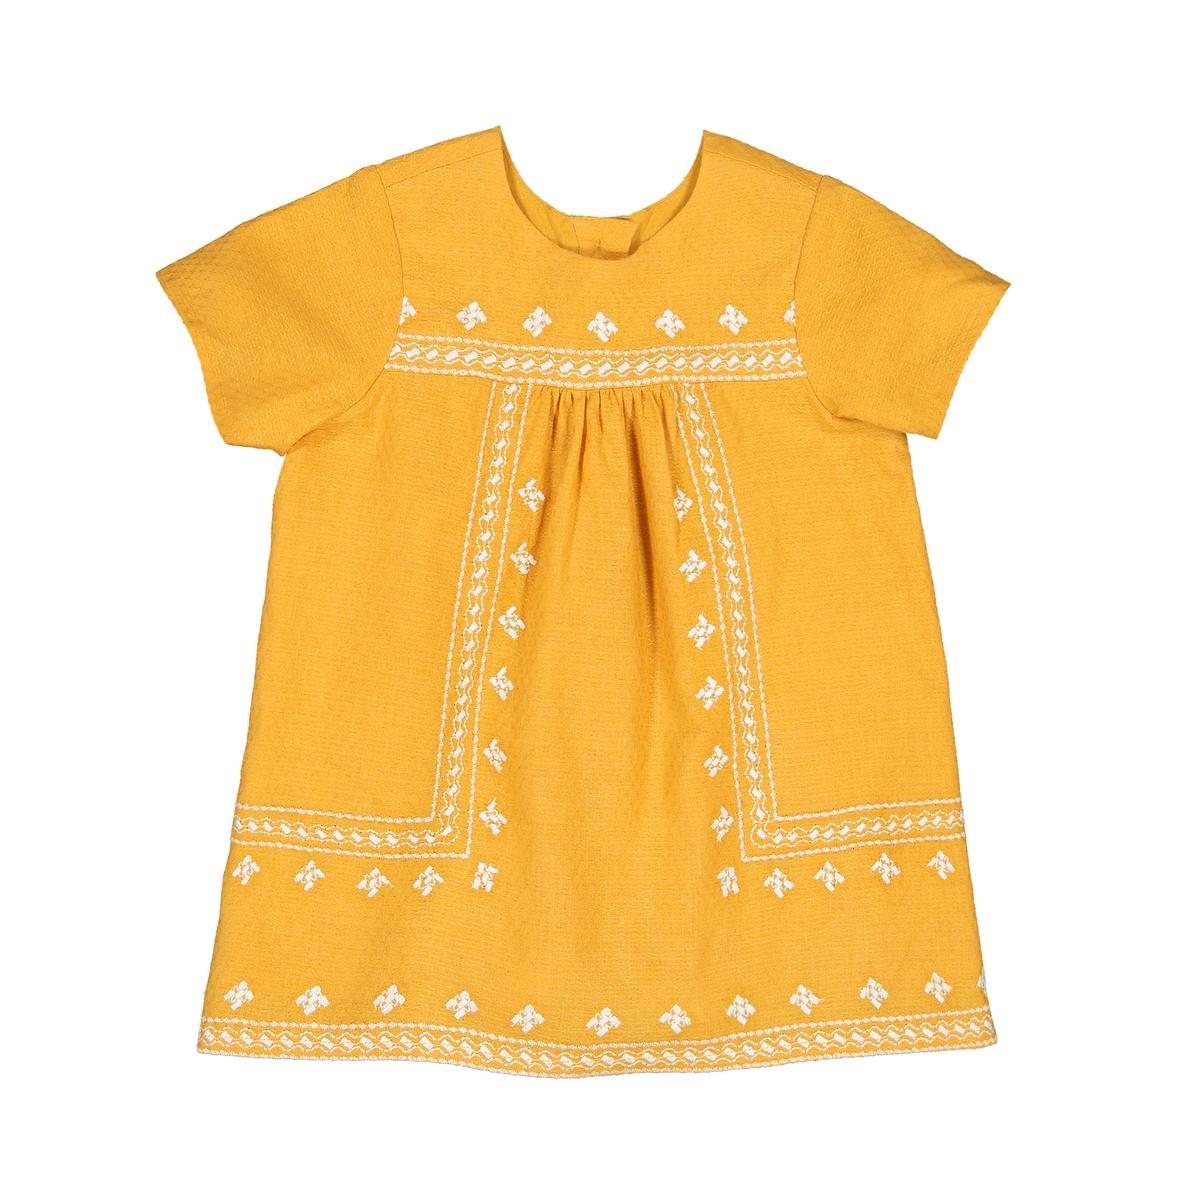 Платье La Redoute С вышивкой и короткими рукавами мес - года 1 мес. - 54 см желтый футболка la redoute с длинными рукавами с вышивкой мес года 0 мес 50 см бежевый